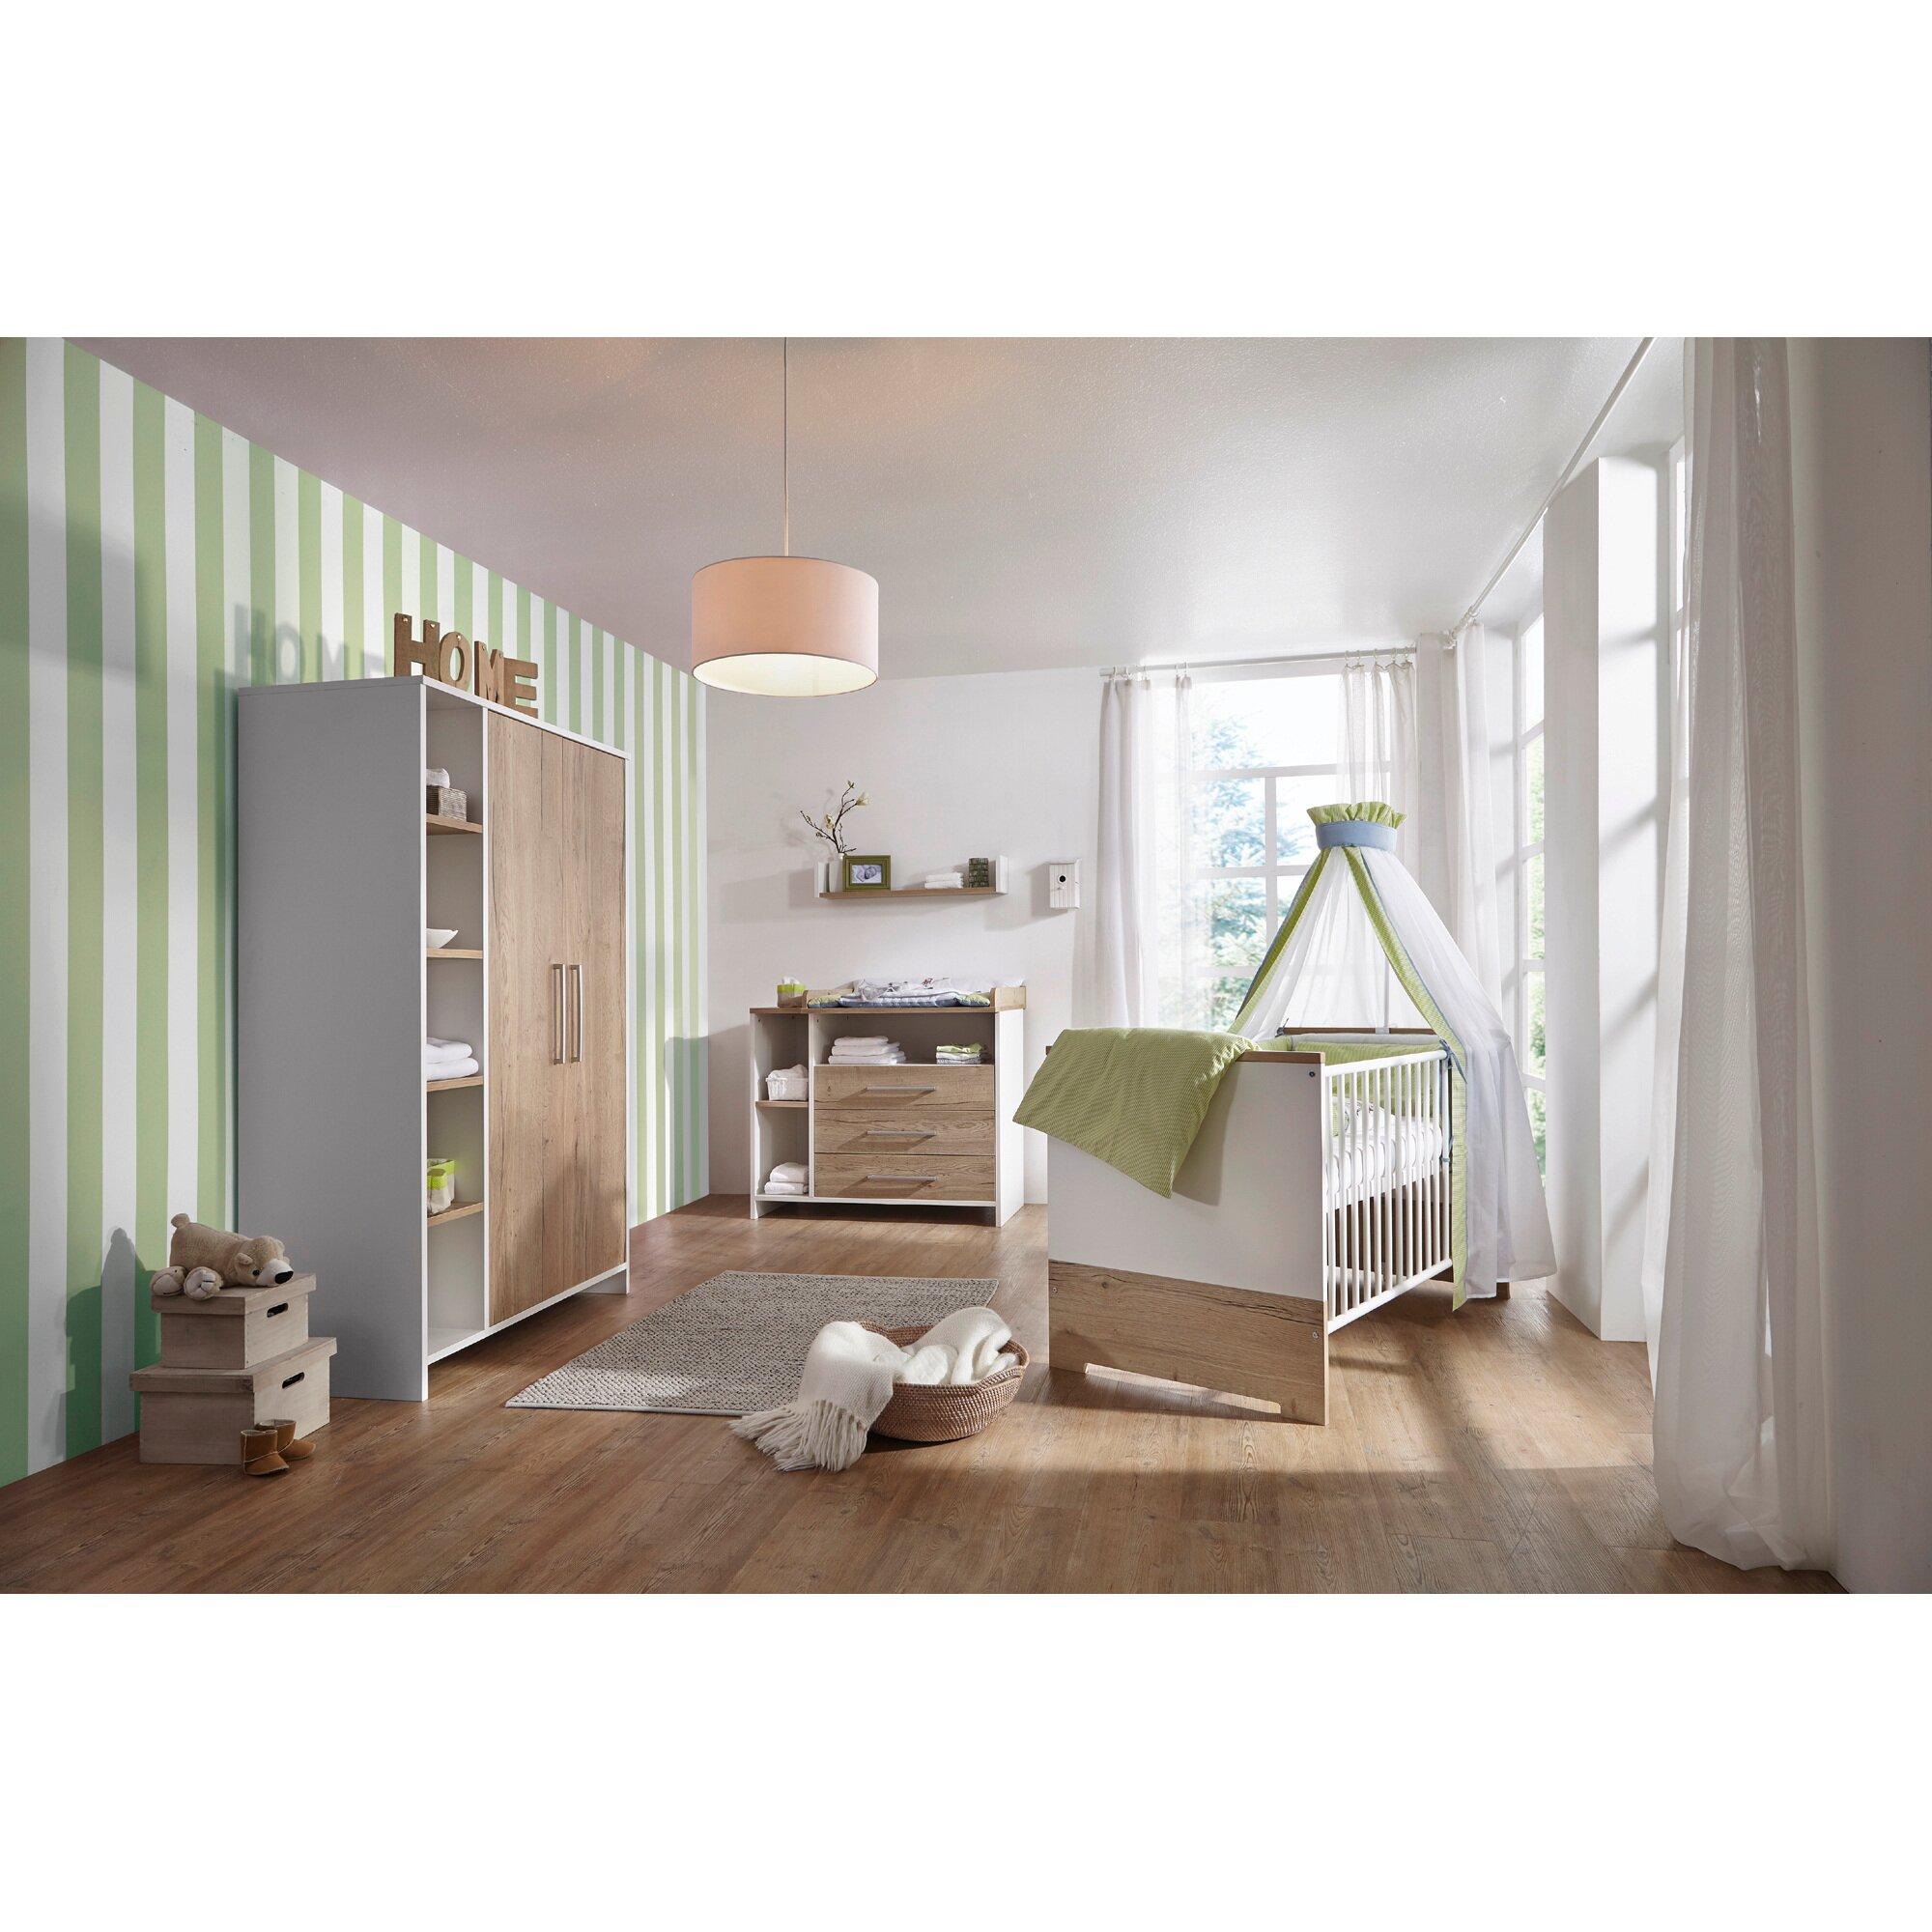 "Schardt Kinderzimmer ""Eco Plus"" inkl. 3trg. Kleiderschrank"